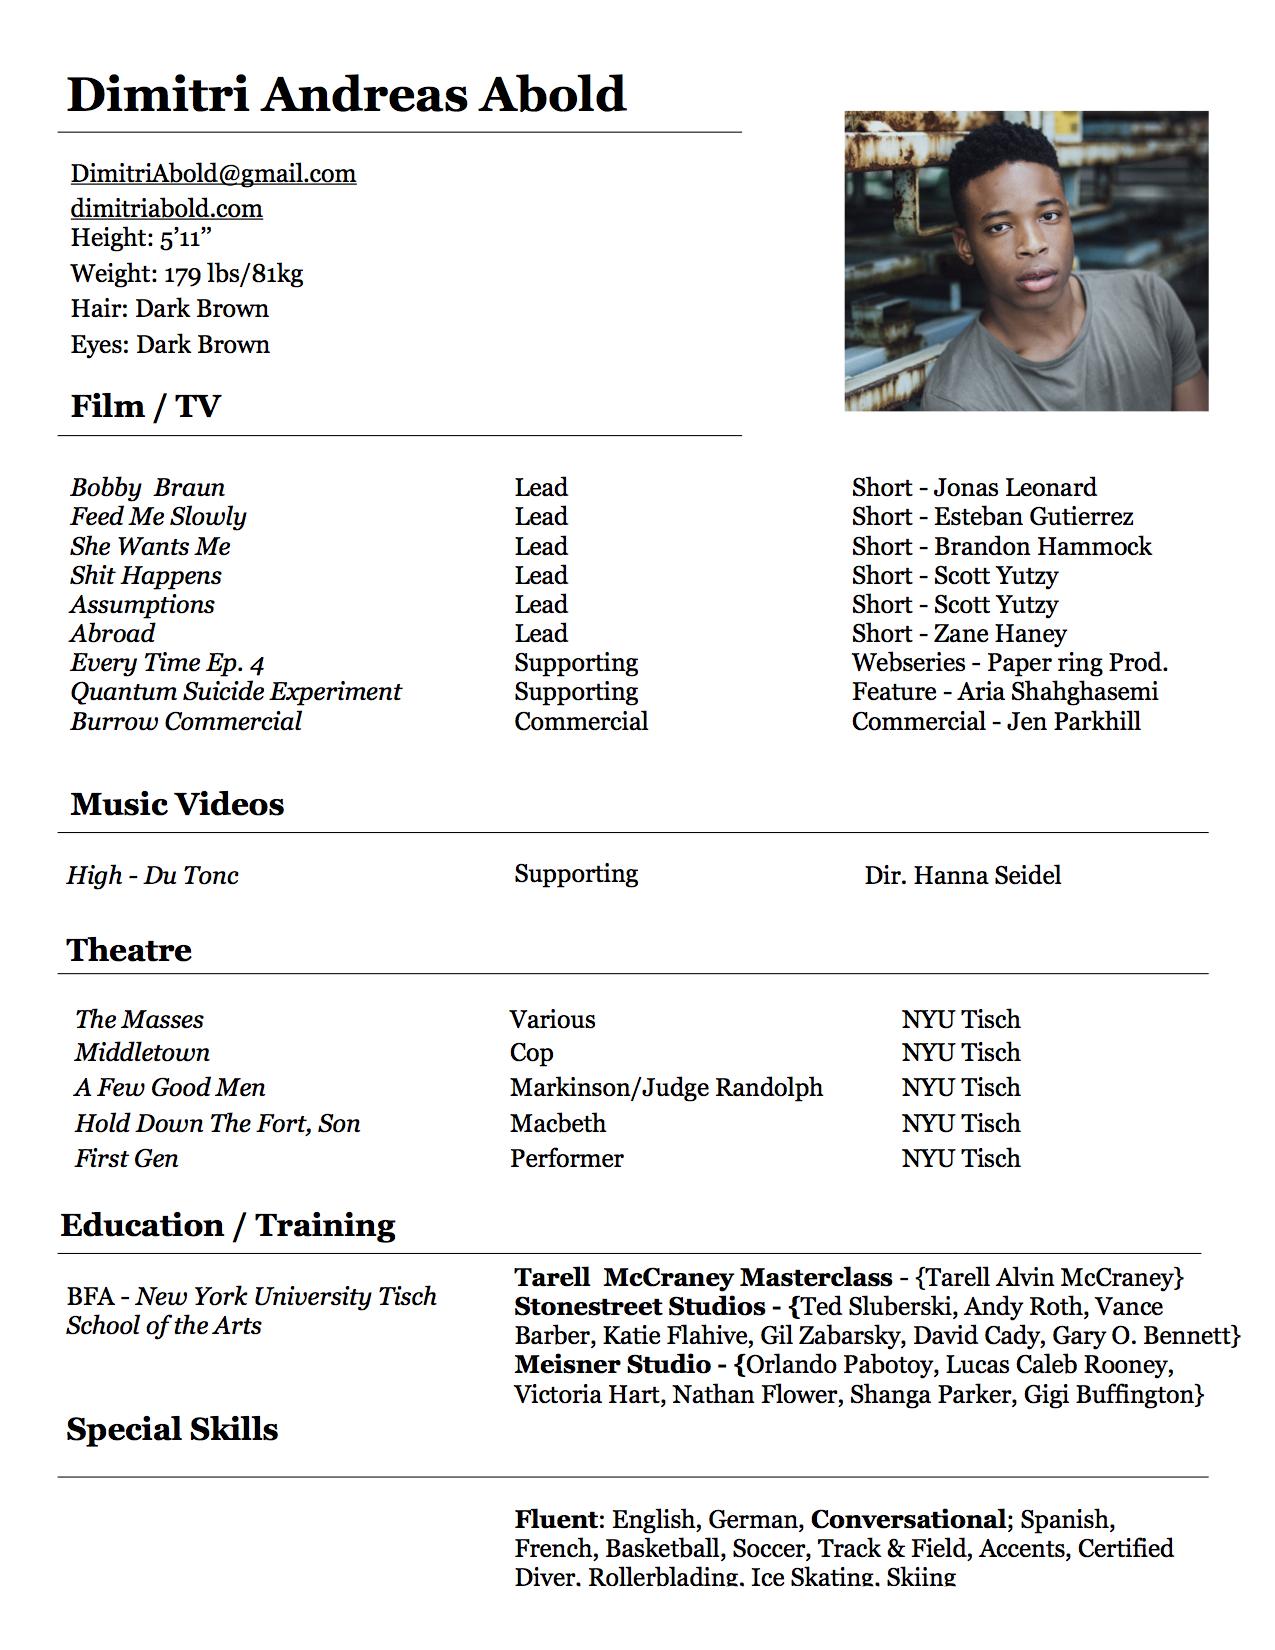 Dimitri Resume 2018 updated.jpg